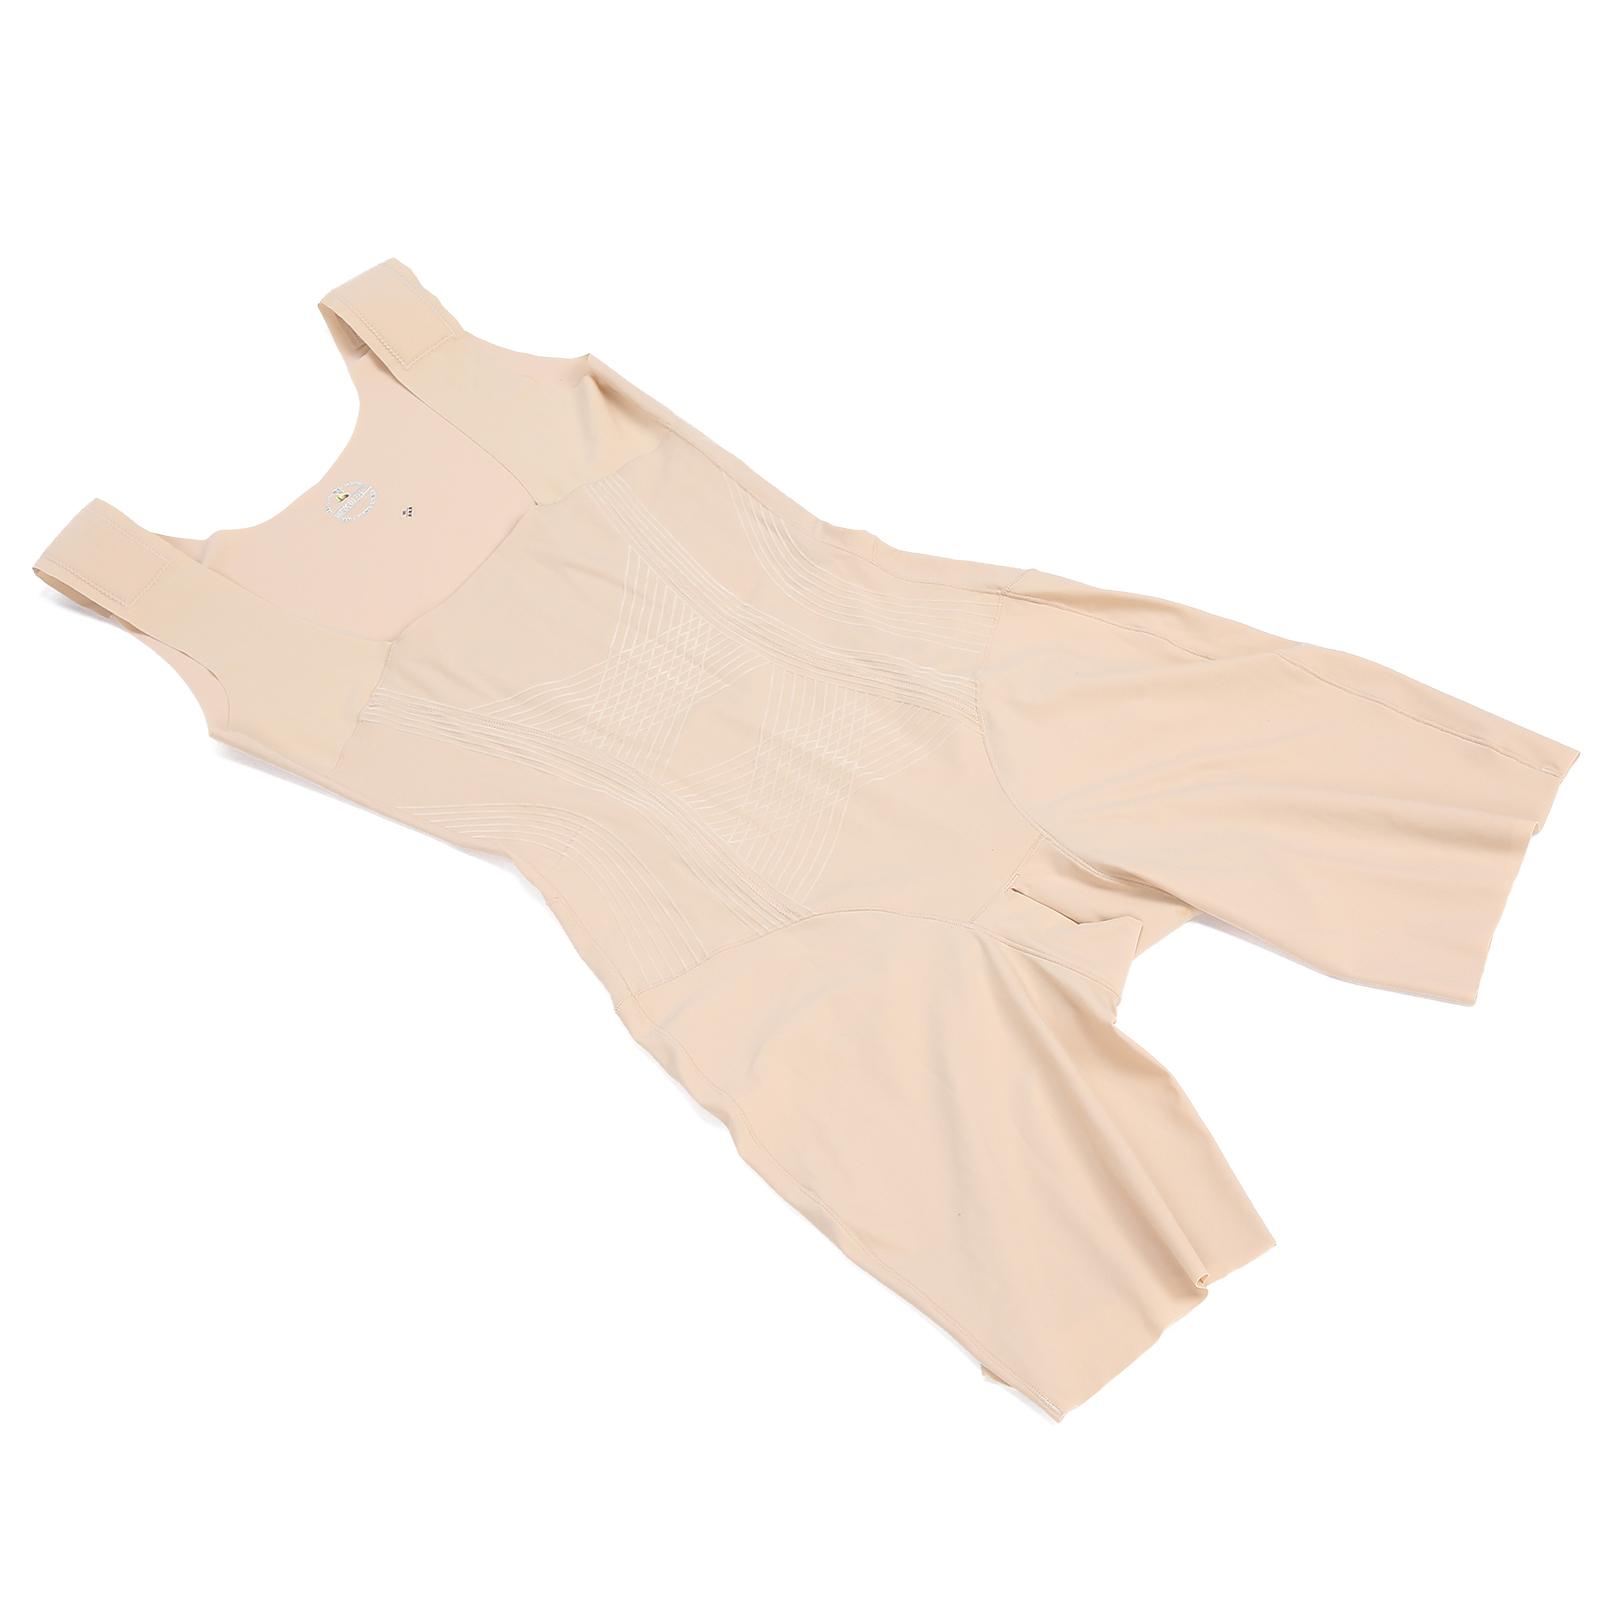 miniature 20 - Women's Full Body Taille Trainer Shaper Taille Corset underbust corset shapewear